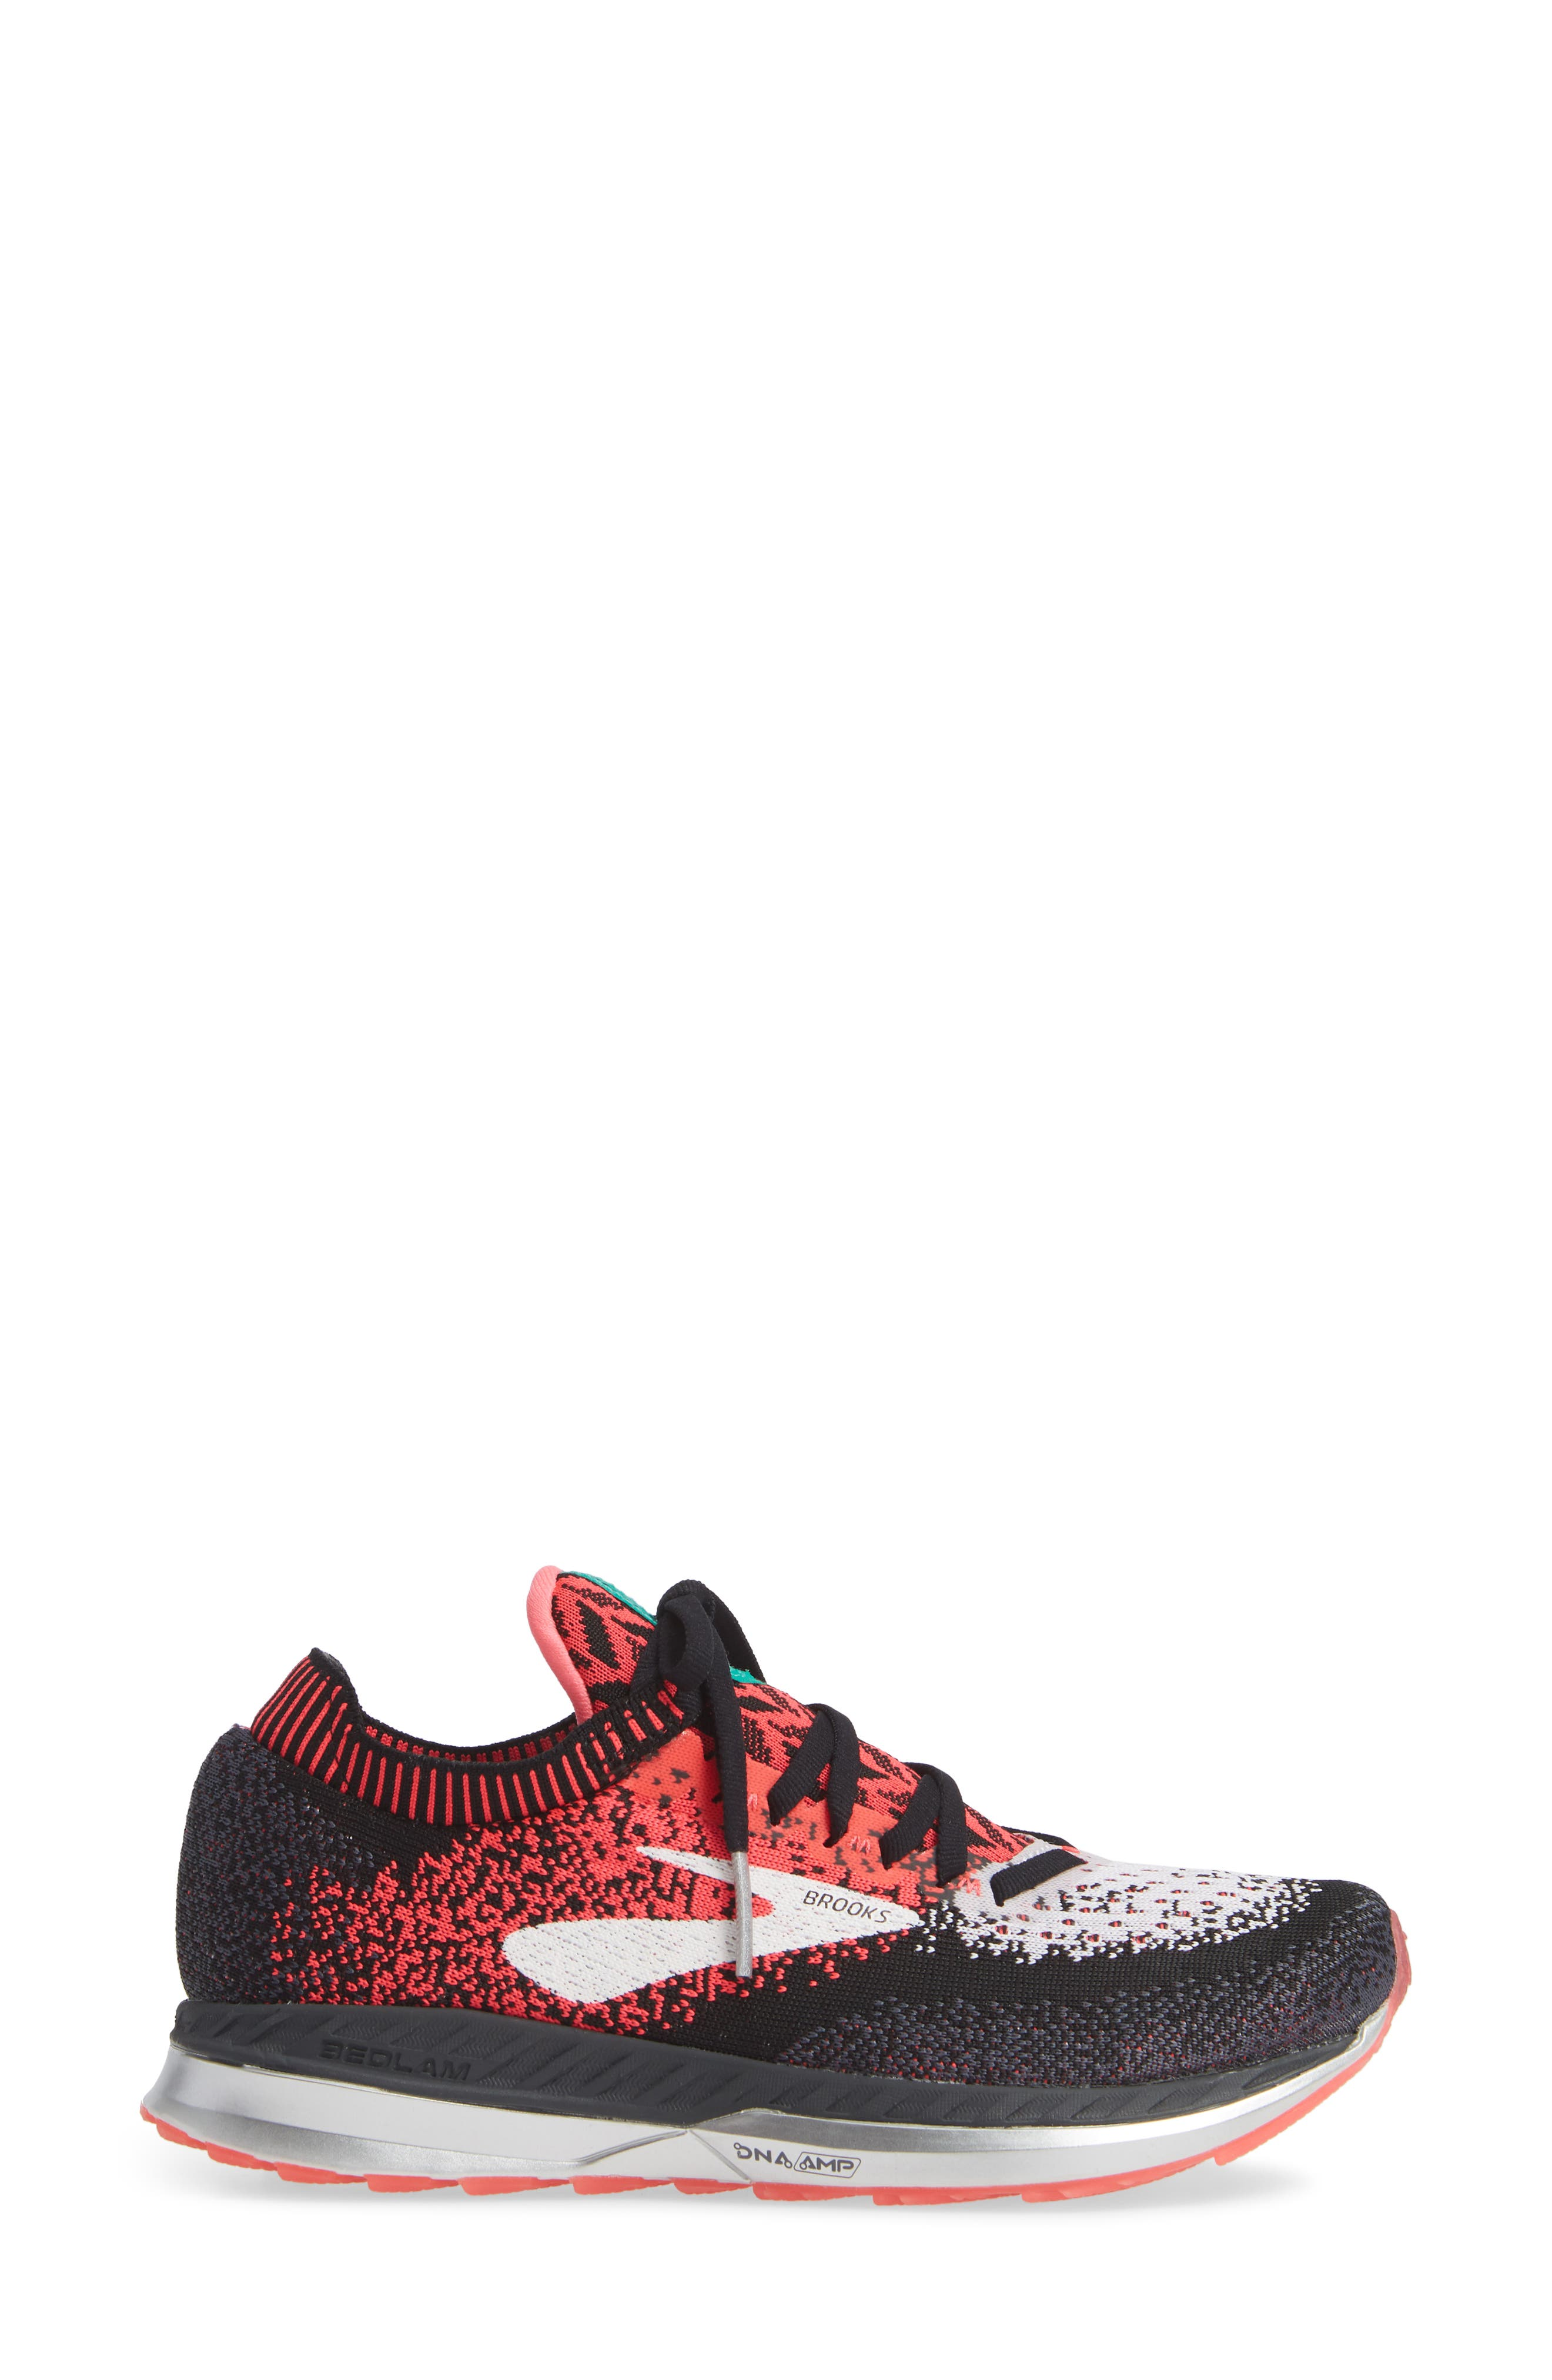 BROOKS, Bedlam Running Shoe, Alternate thumbnail 3, color, PINK/ BLACK/ WHITE